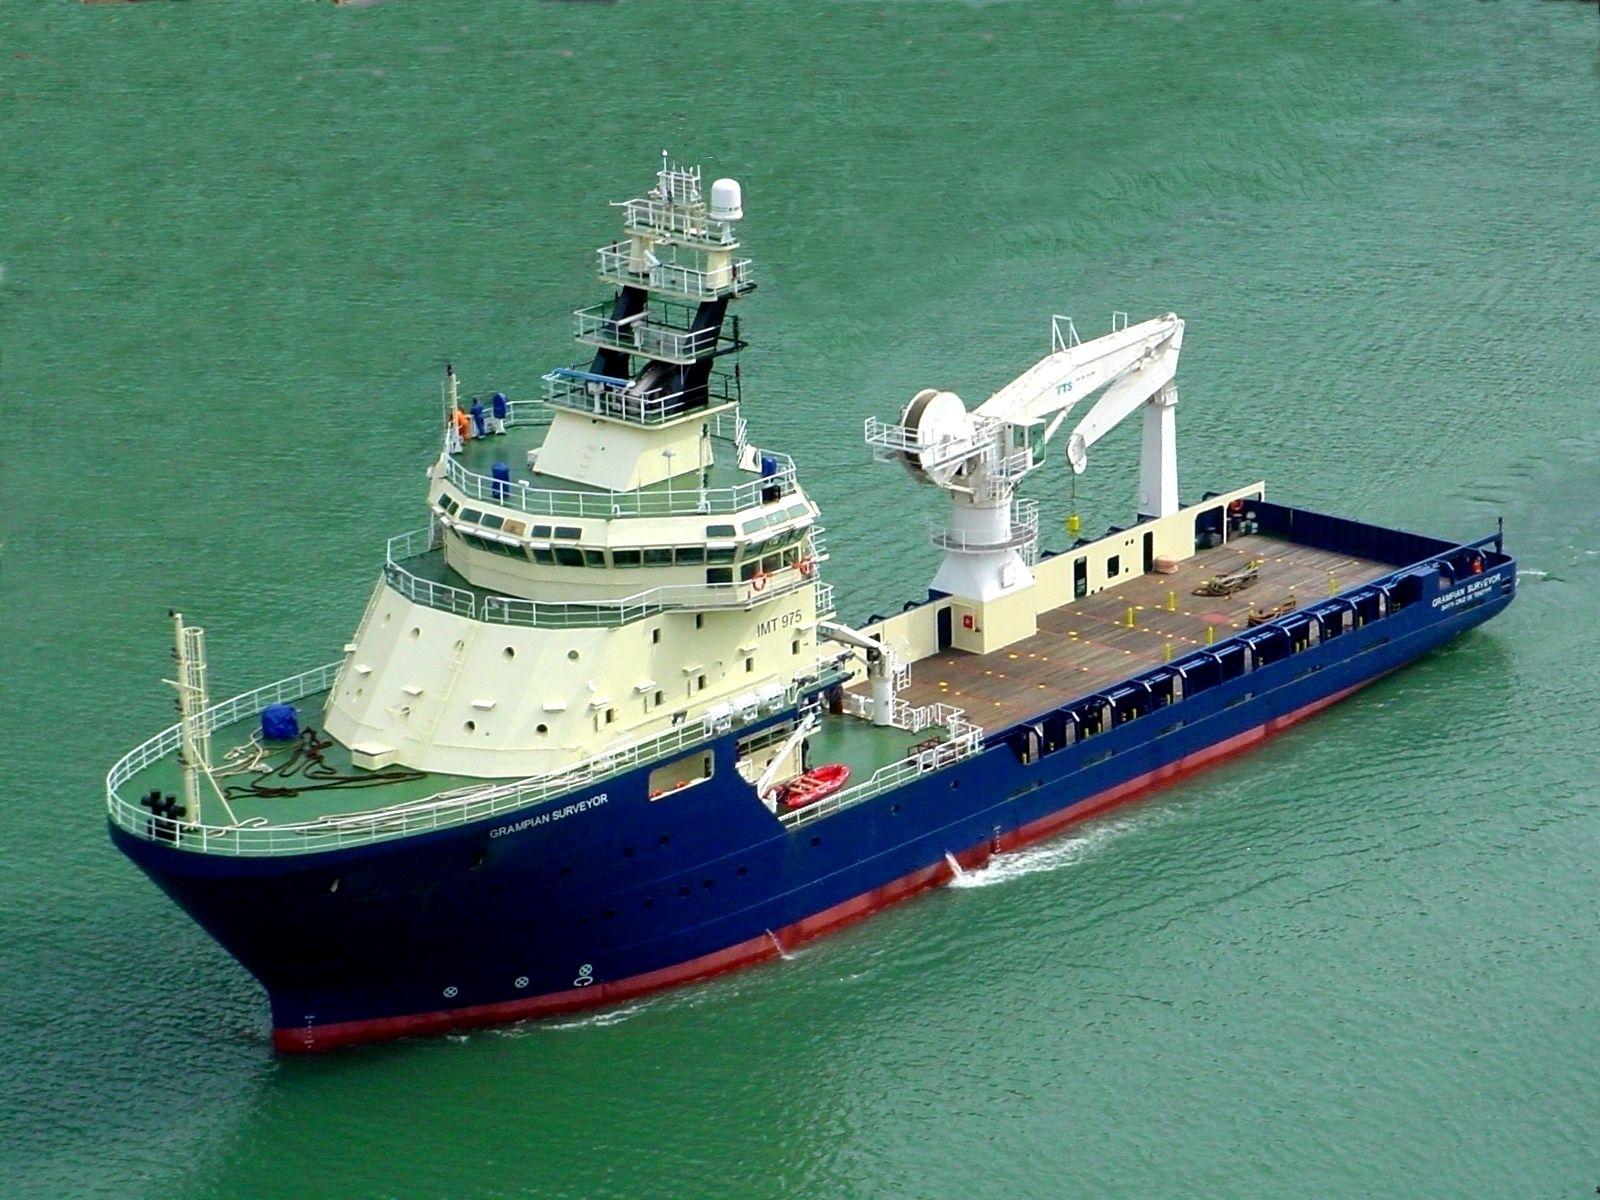 Osd Imt975 Supply Rov Survey Vessel Marine Engineering